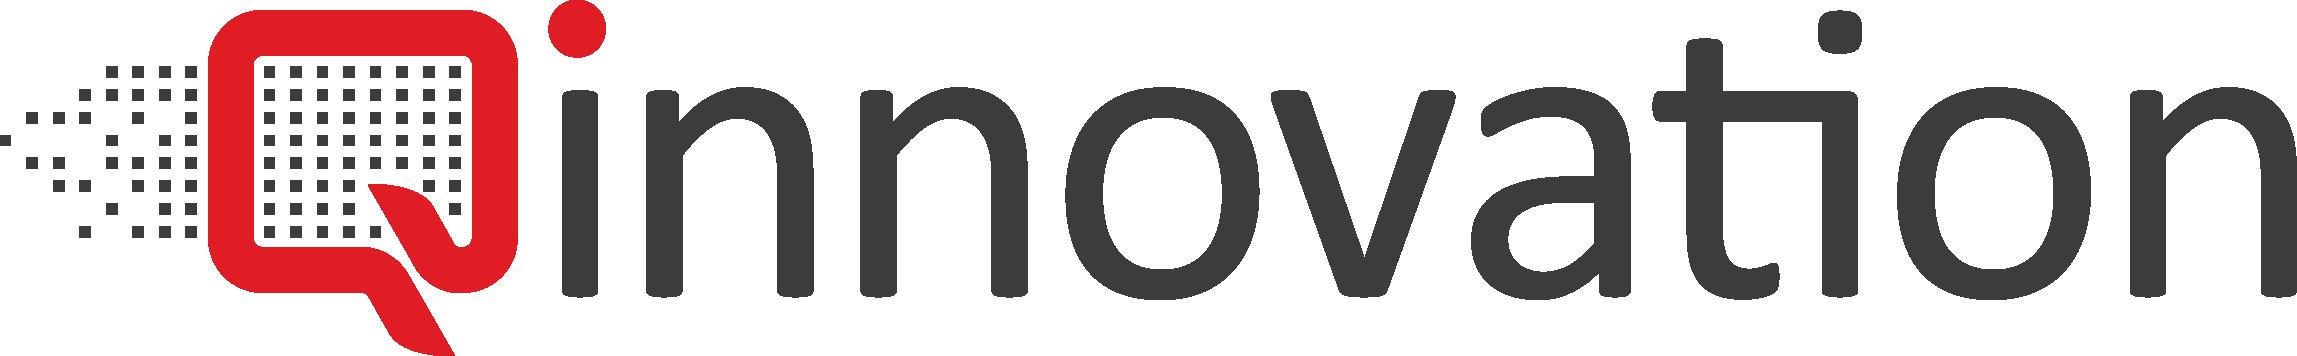 qinnovation-logo.png